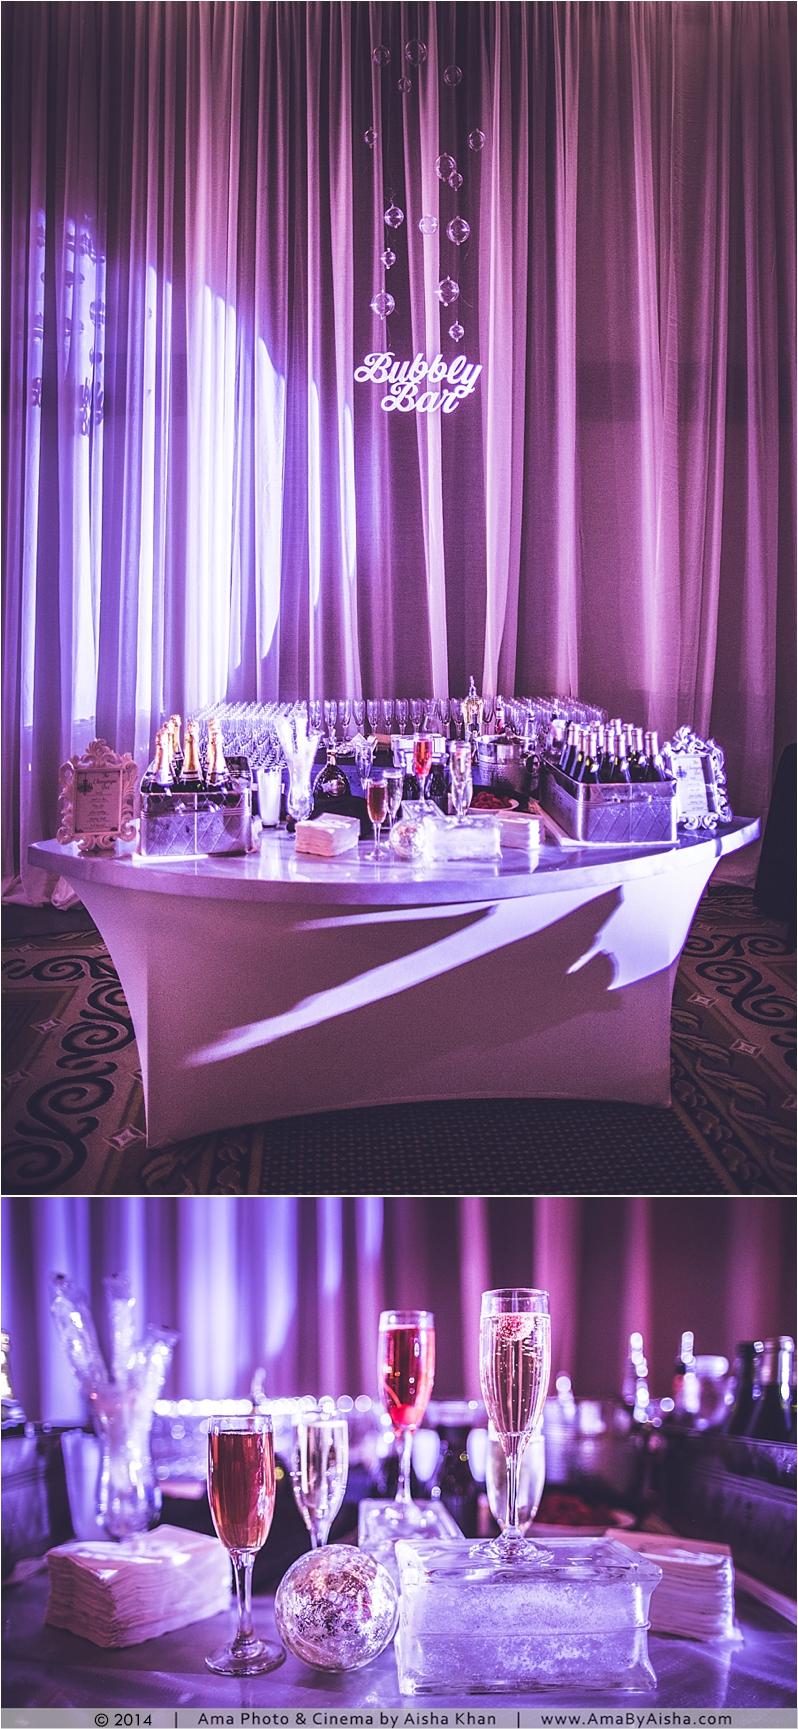 ©2014 | www.AmaByAisha.com | Texas wedding photographer | Bubbly Bar!